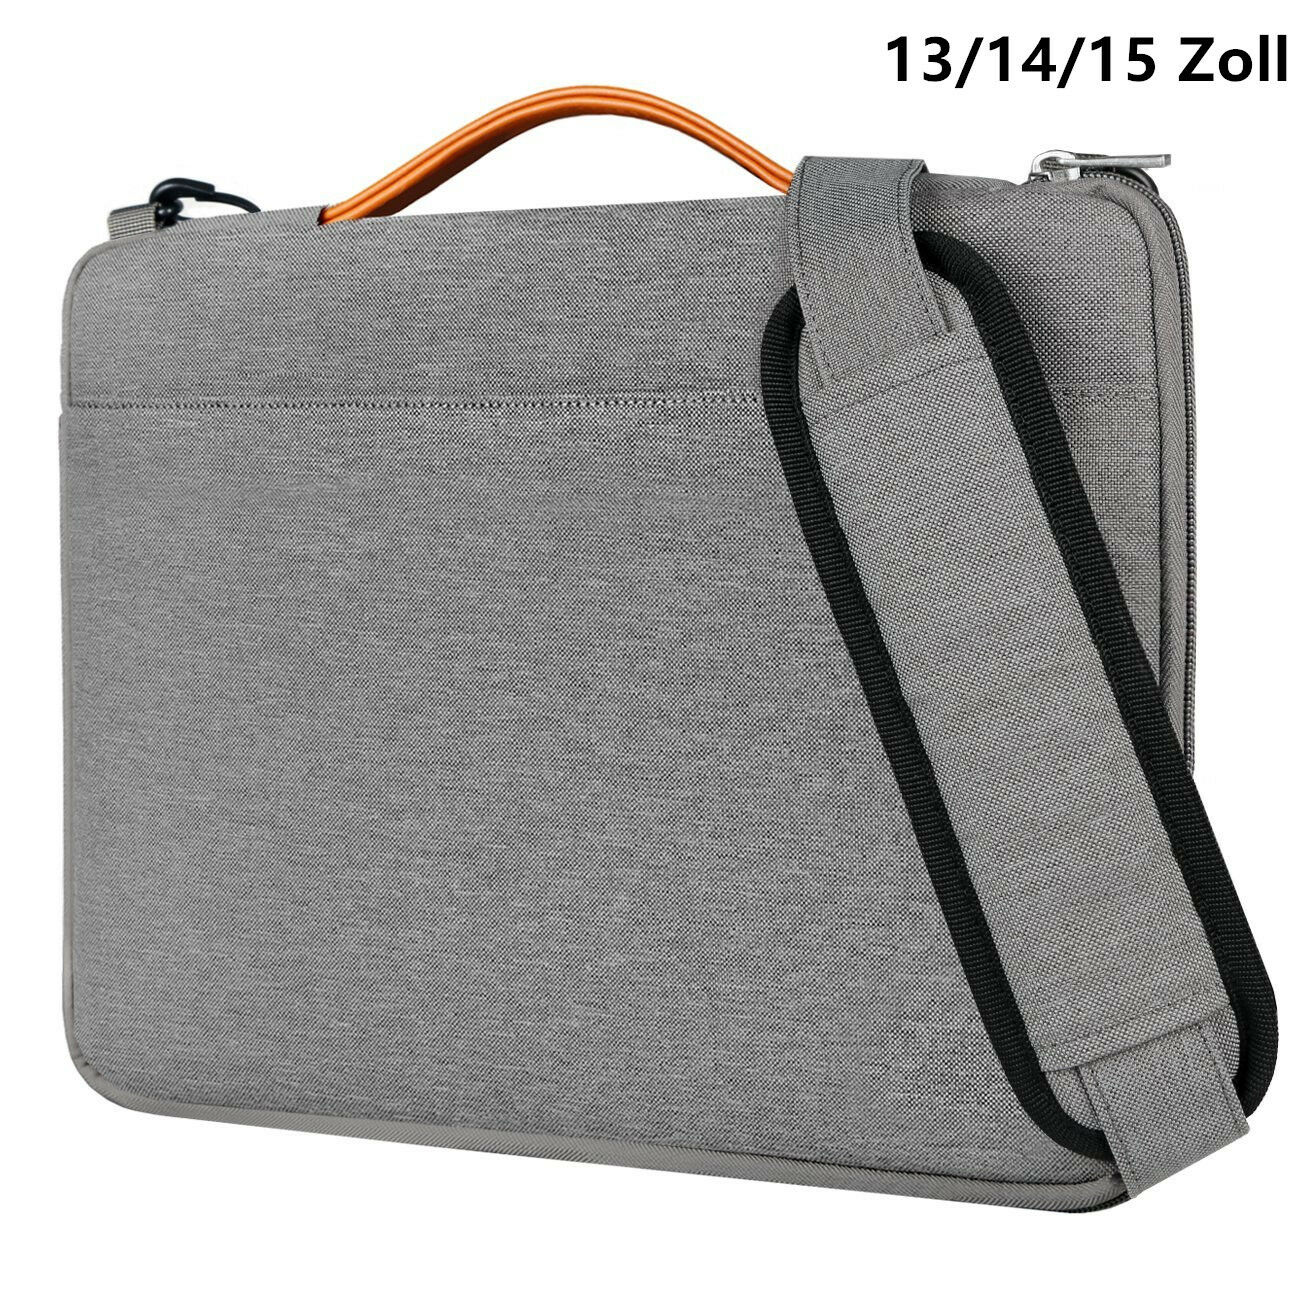 Inateck 13-15 Zoll Schultertasche wasserdichte Laptop Hülle Notebooks Ultrabooks